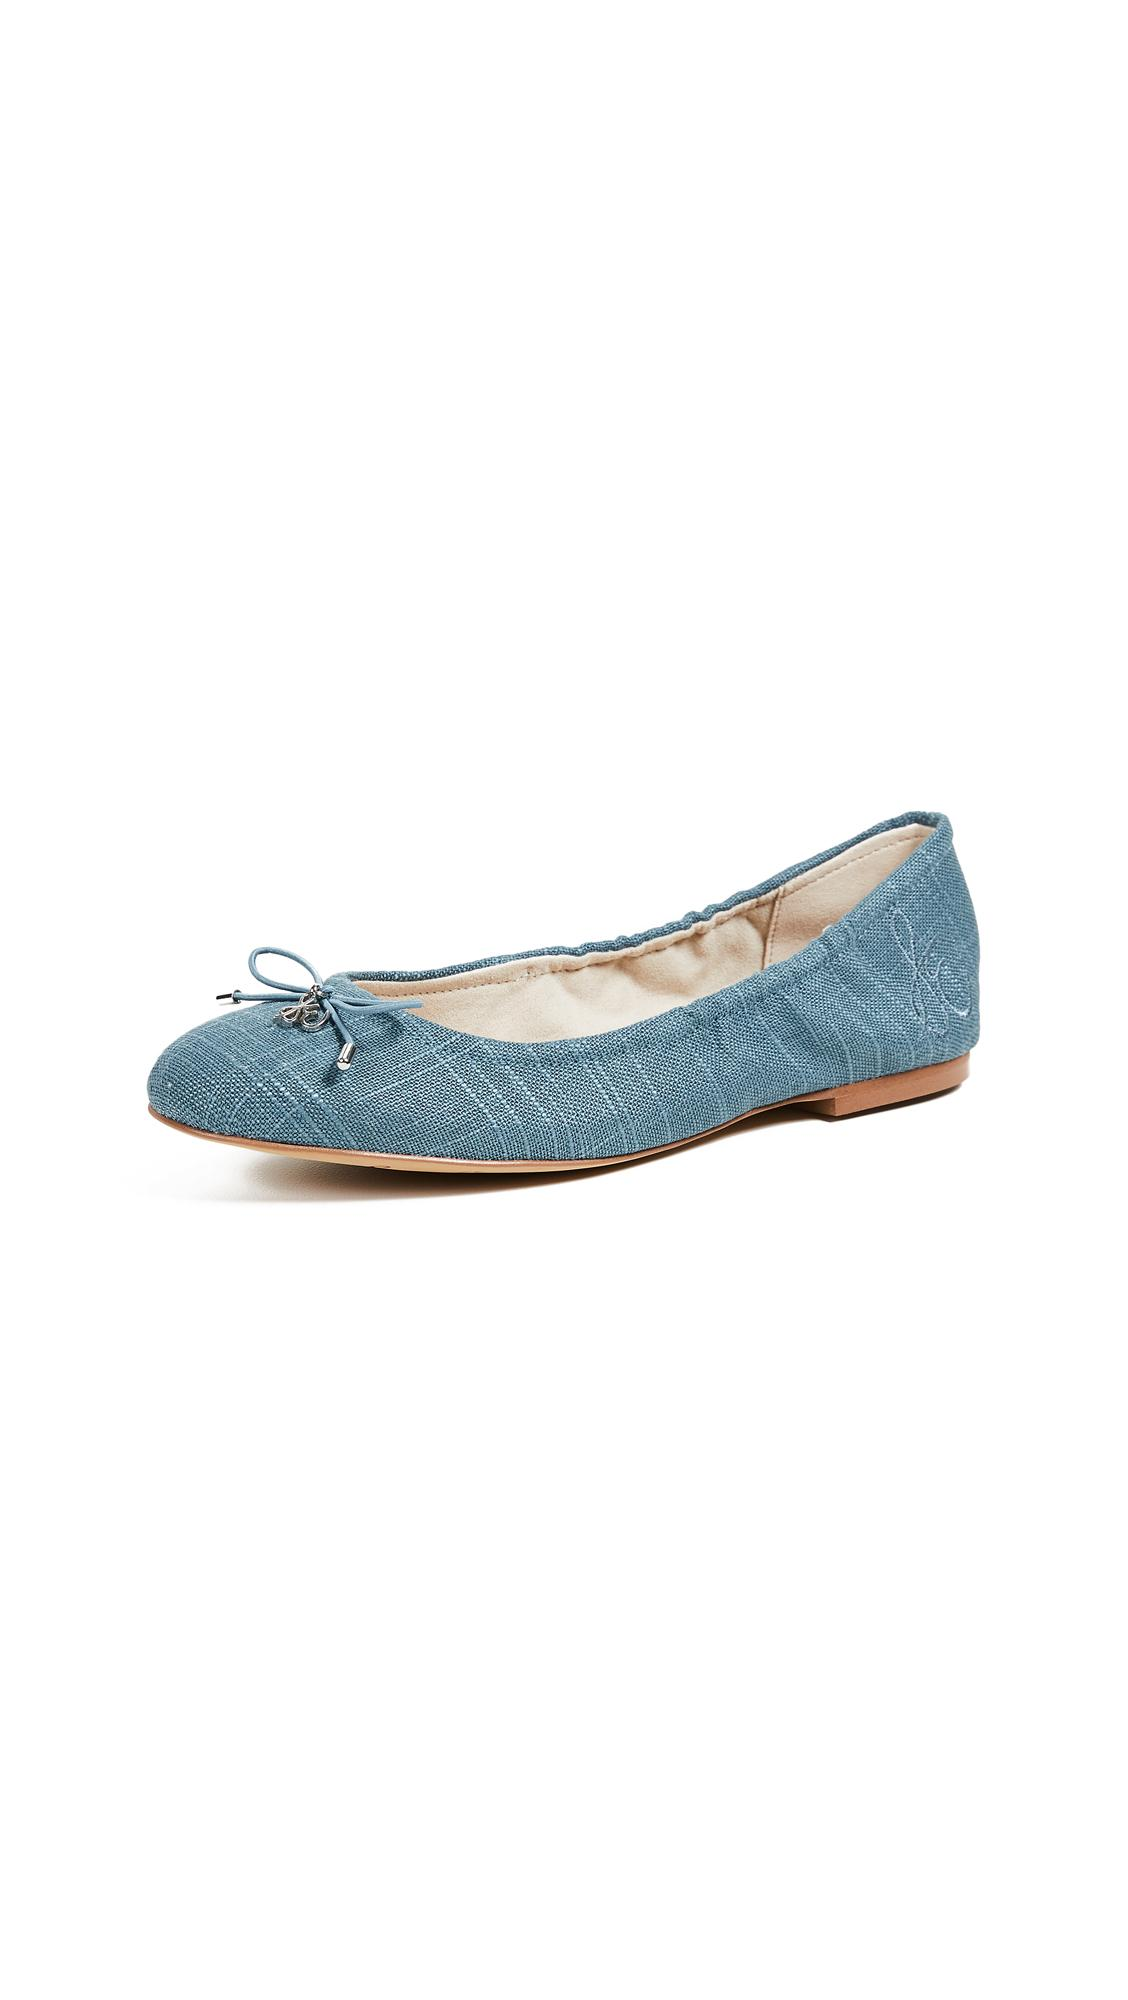 7b231a883 Sam Edelman Felicia Ballet Flats In Denim Blue